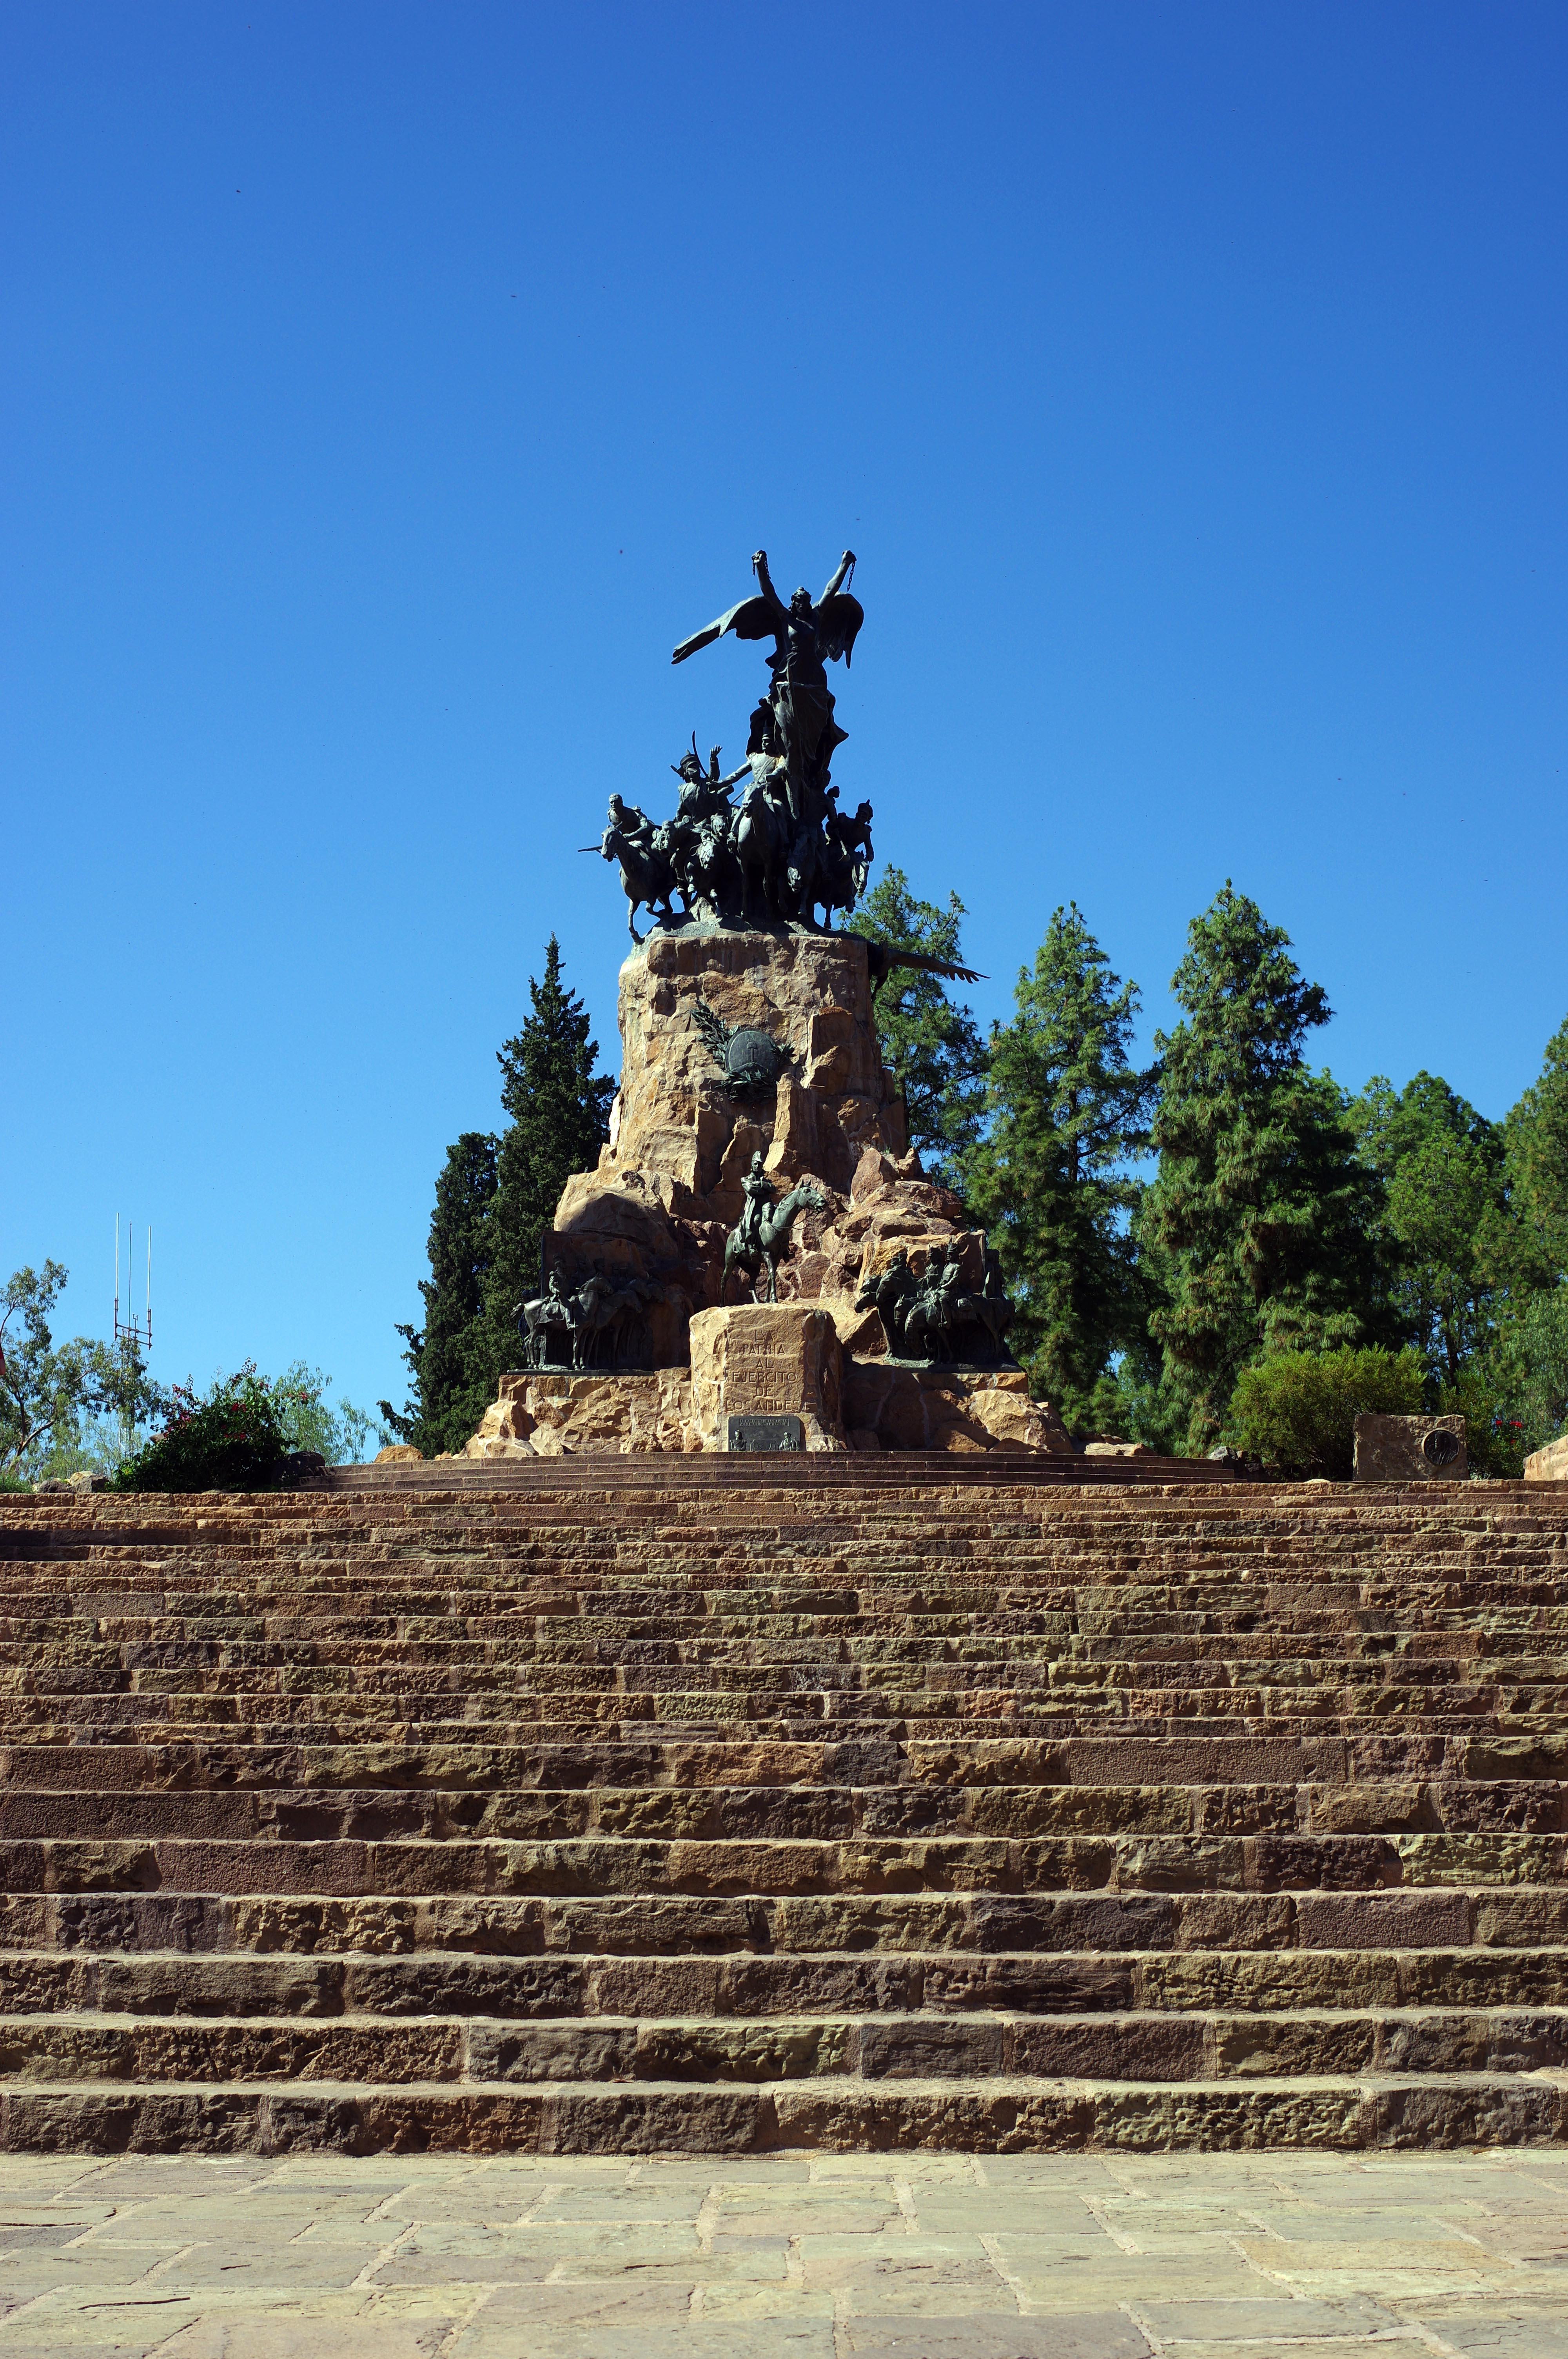 171226_Mendoza-CerroGloria71